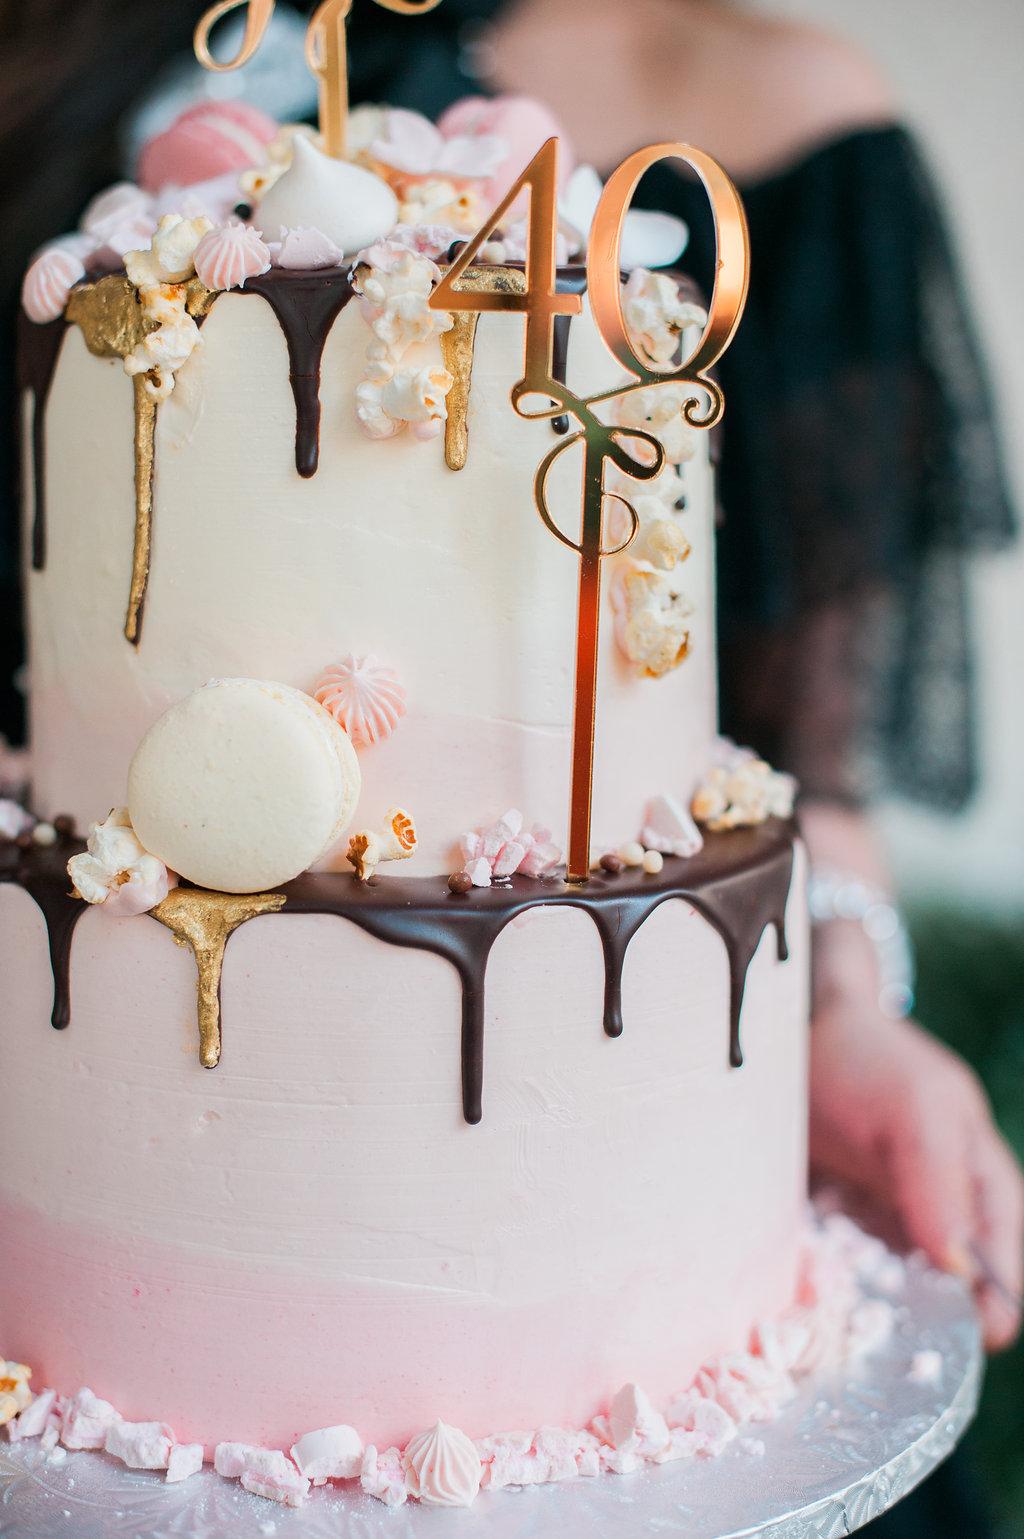 CAKE TOPPER, SHOP TINEKE